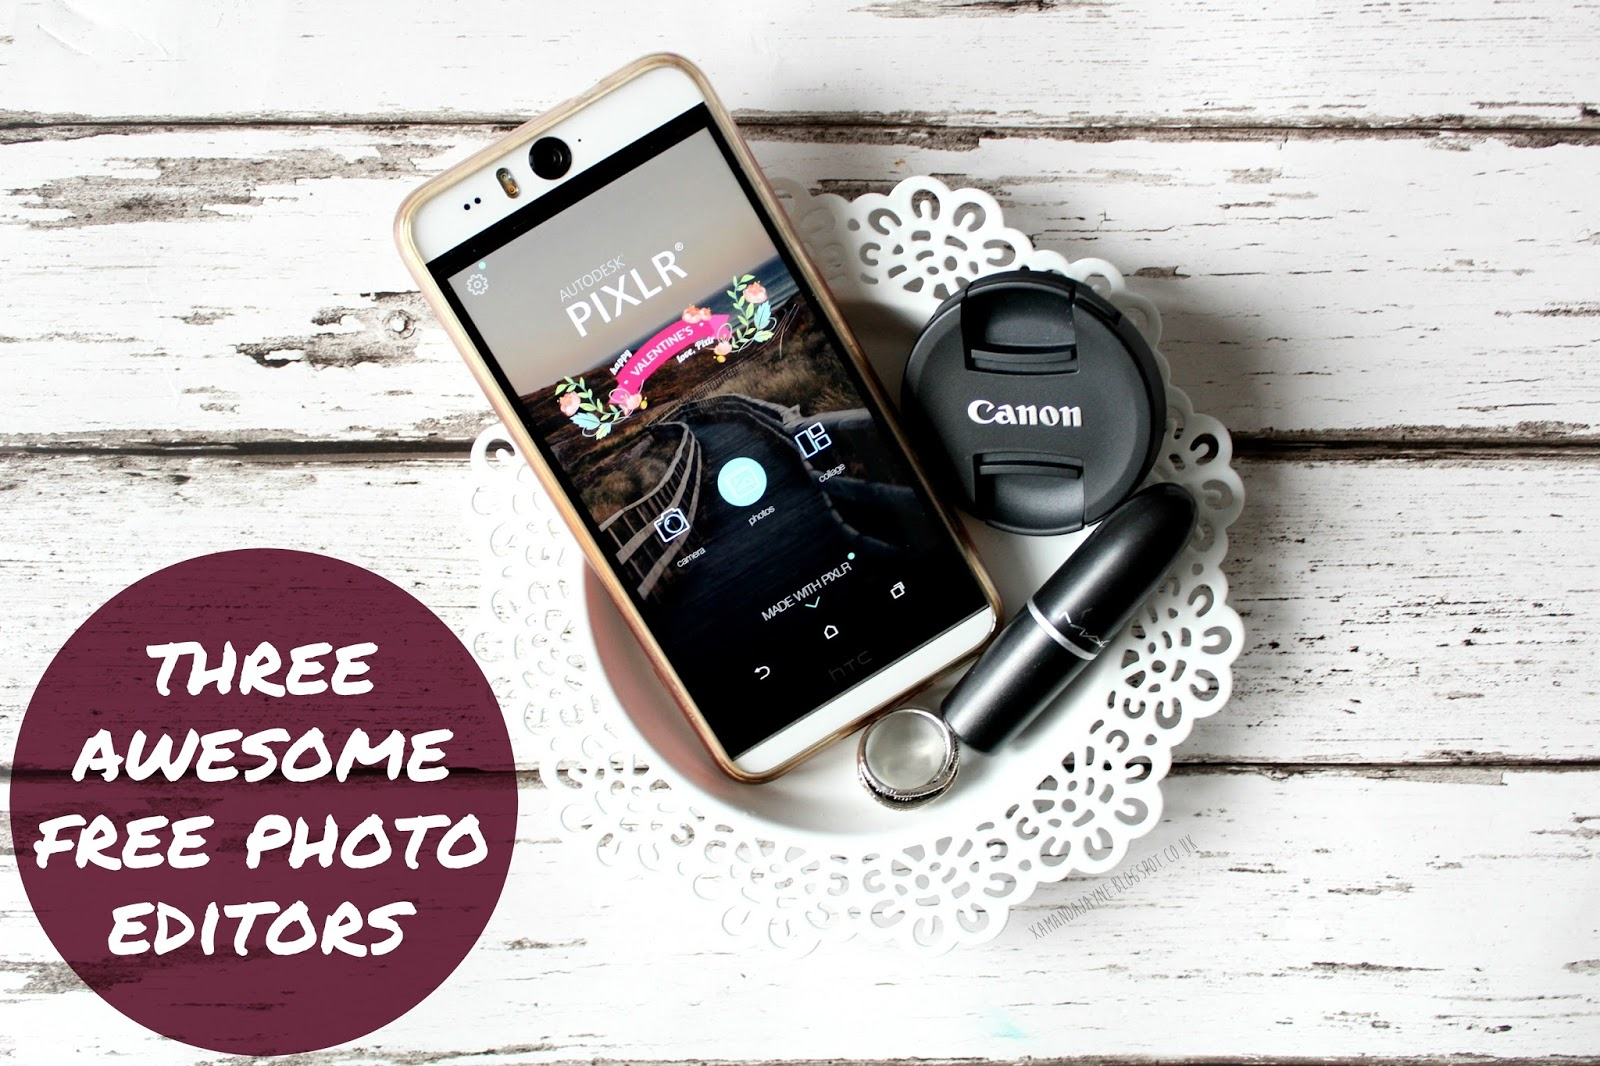 3 free photo editors, useful photo editors, picasa photo editor, pixlr photo editor, picmonkey photo editor, tips & tricks